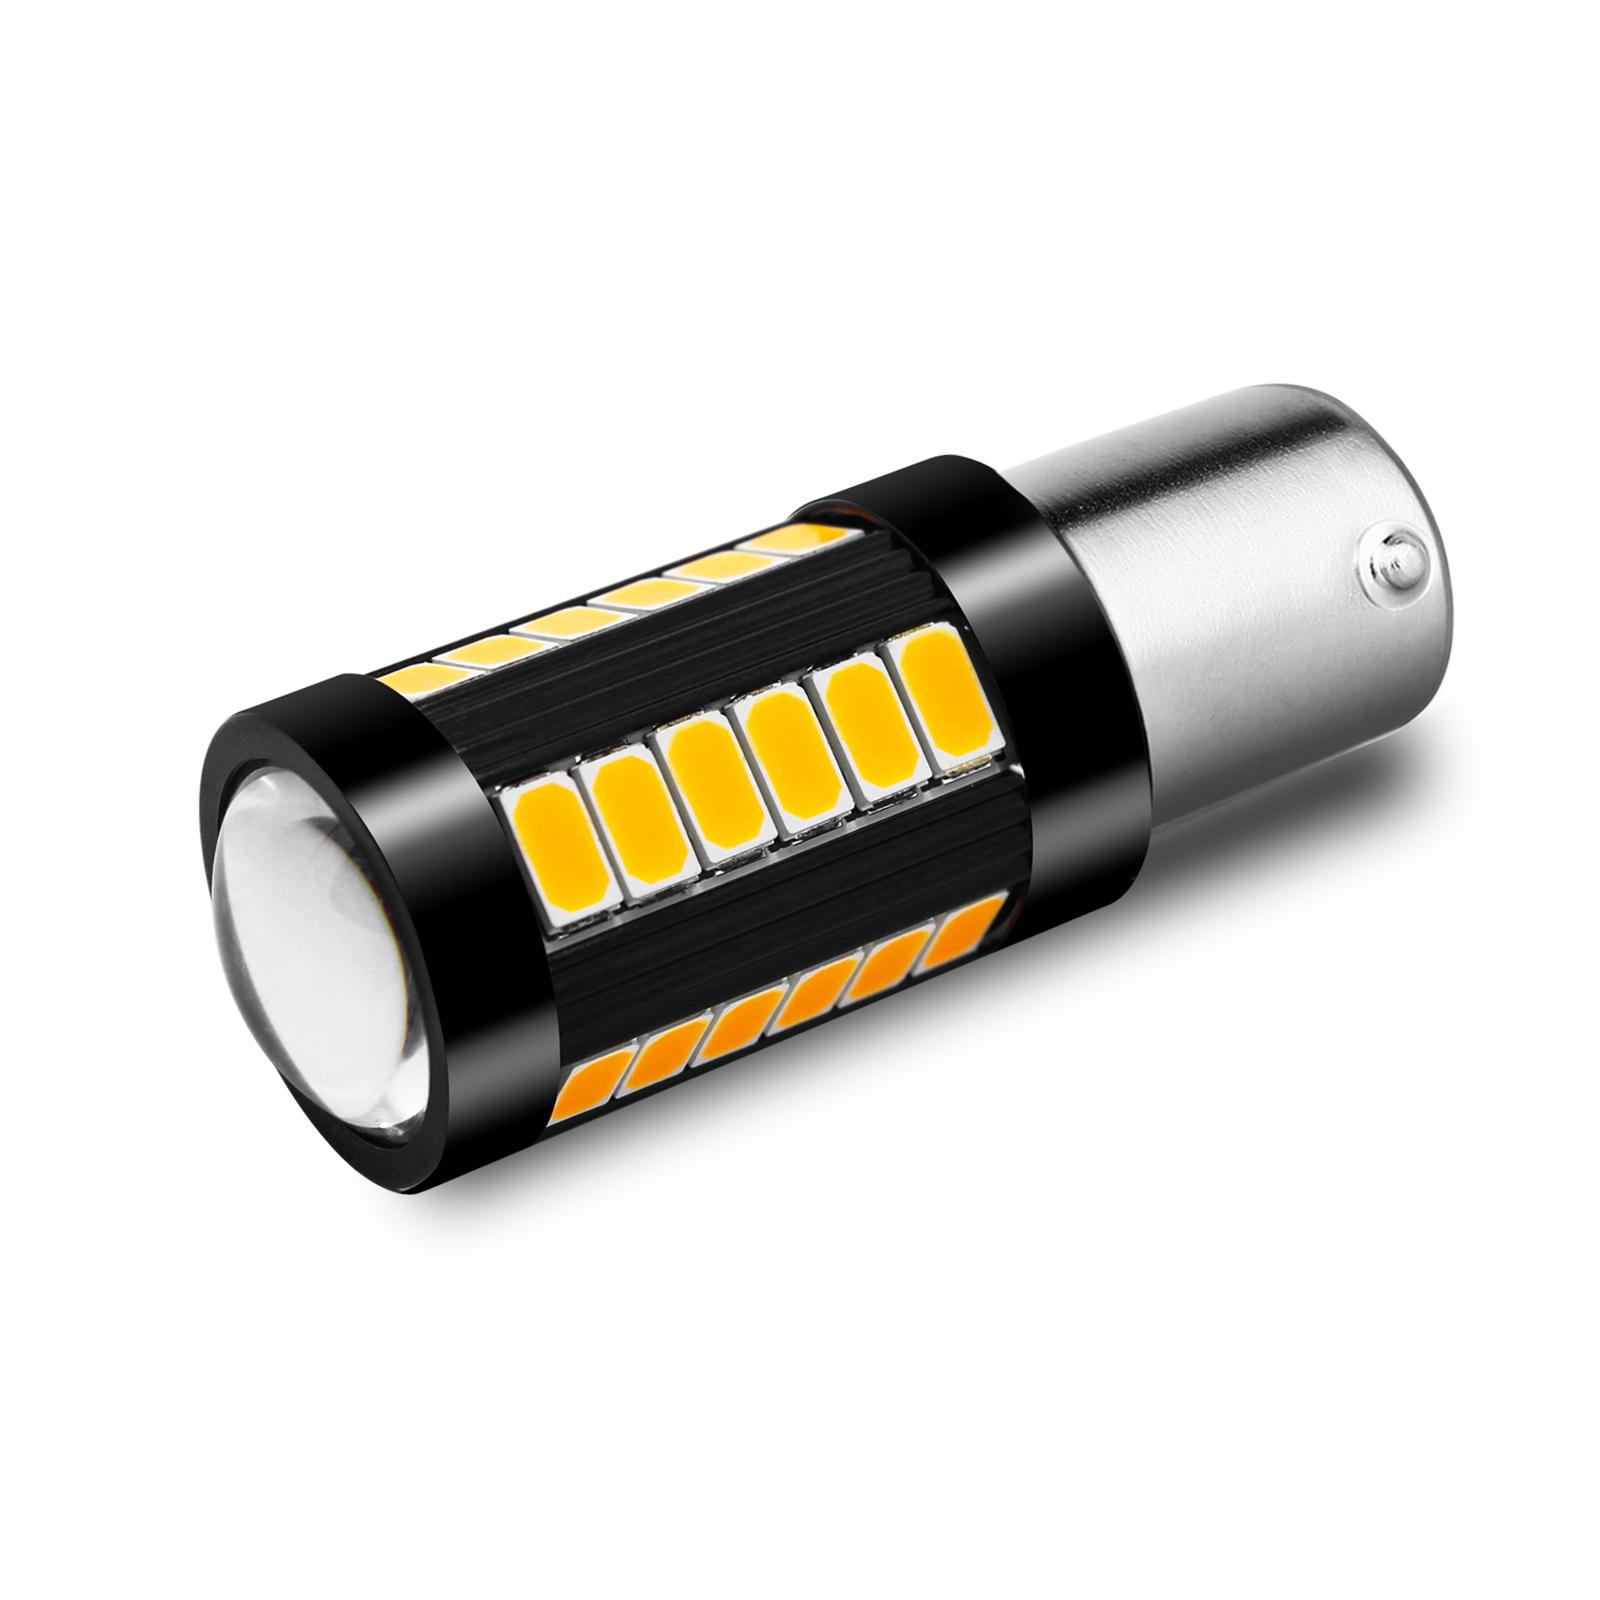 Automotive LED Rear Turn Signal Light Bulb for 2018 Honda Accord Cars